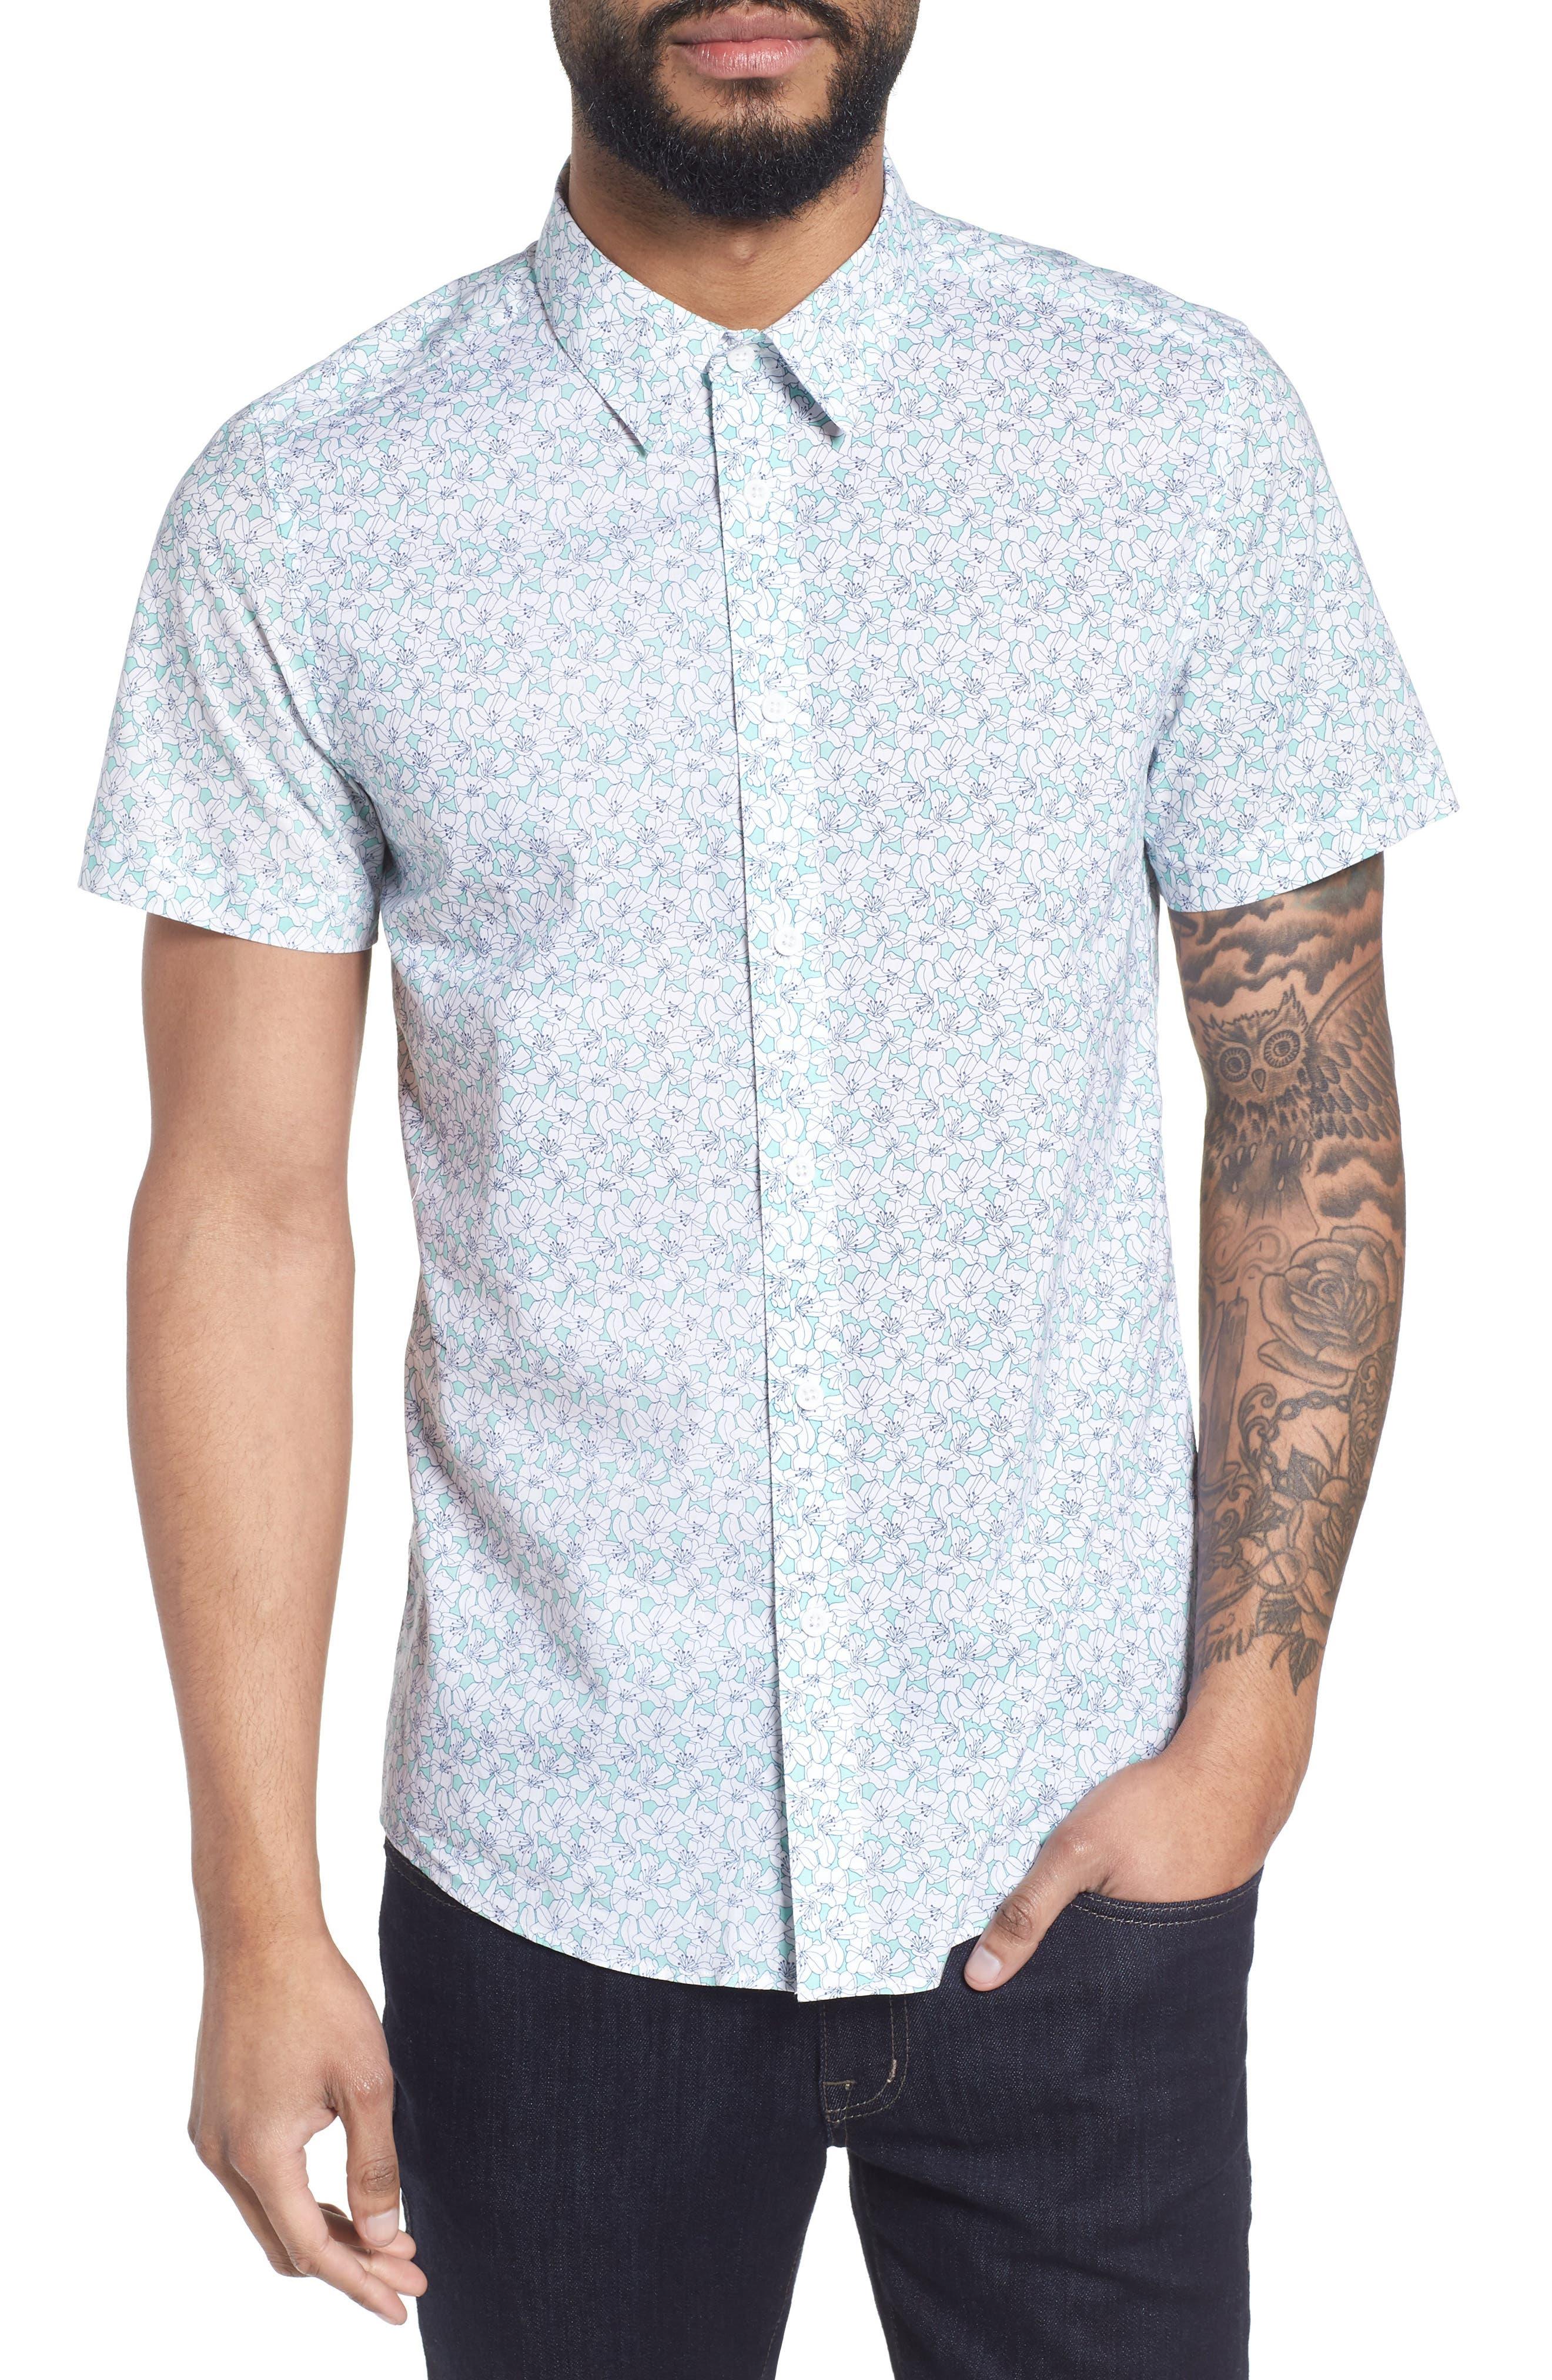 Main Image - TWENTYMETRICTONS Slim Flit Floral Woven Shirt